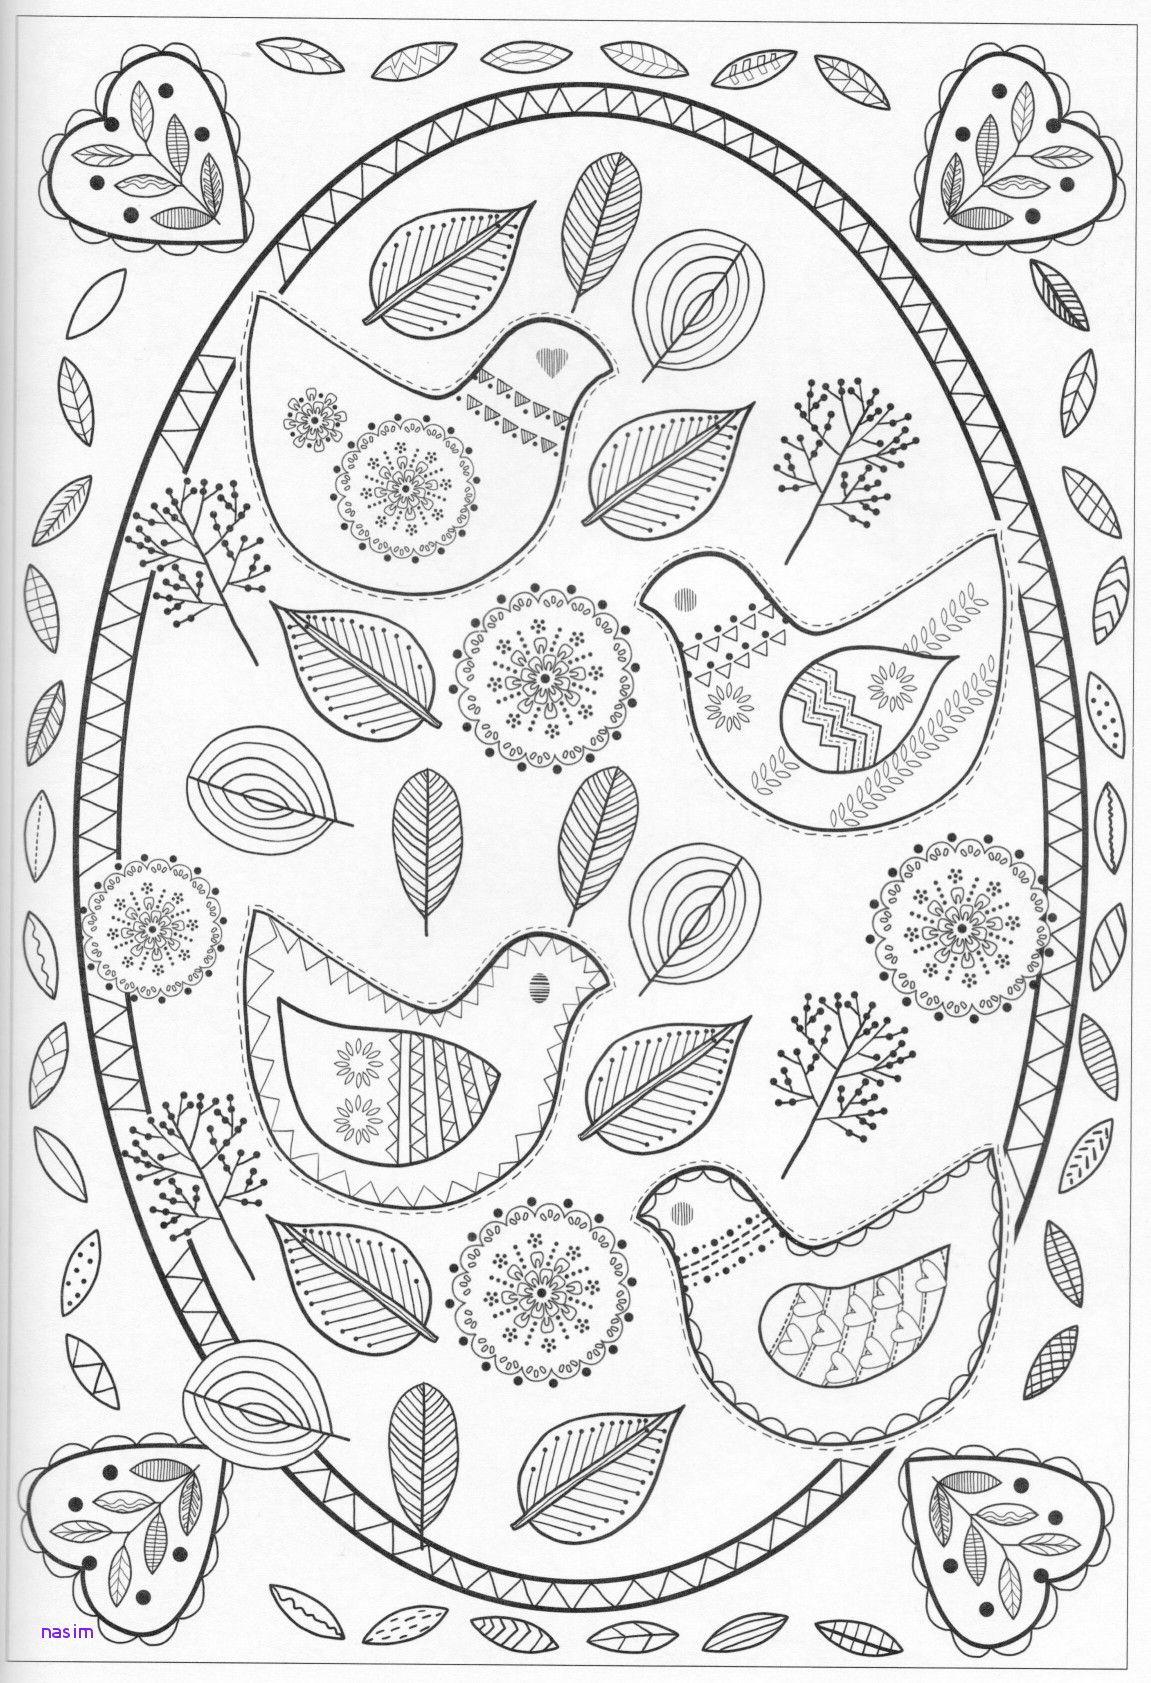 Libros De Colorear Para Adultos En Egipto Elegante 149 Dibujos Para ...